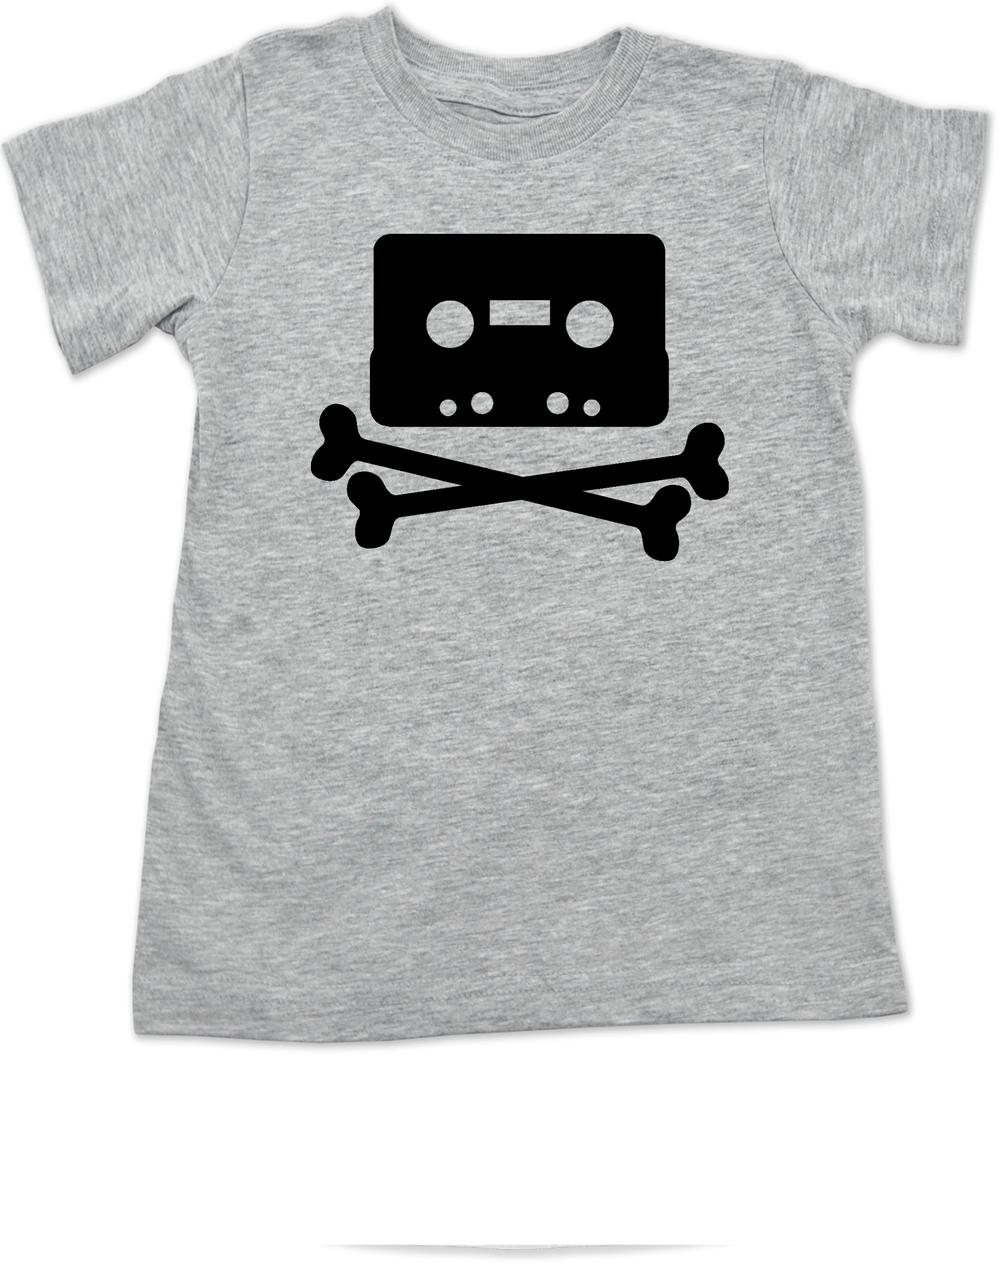 Pirate Toddler Shirt